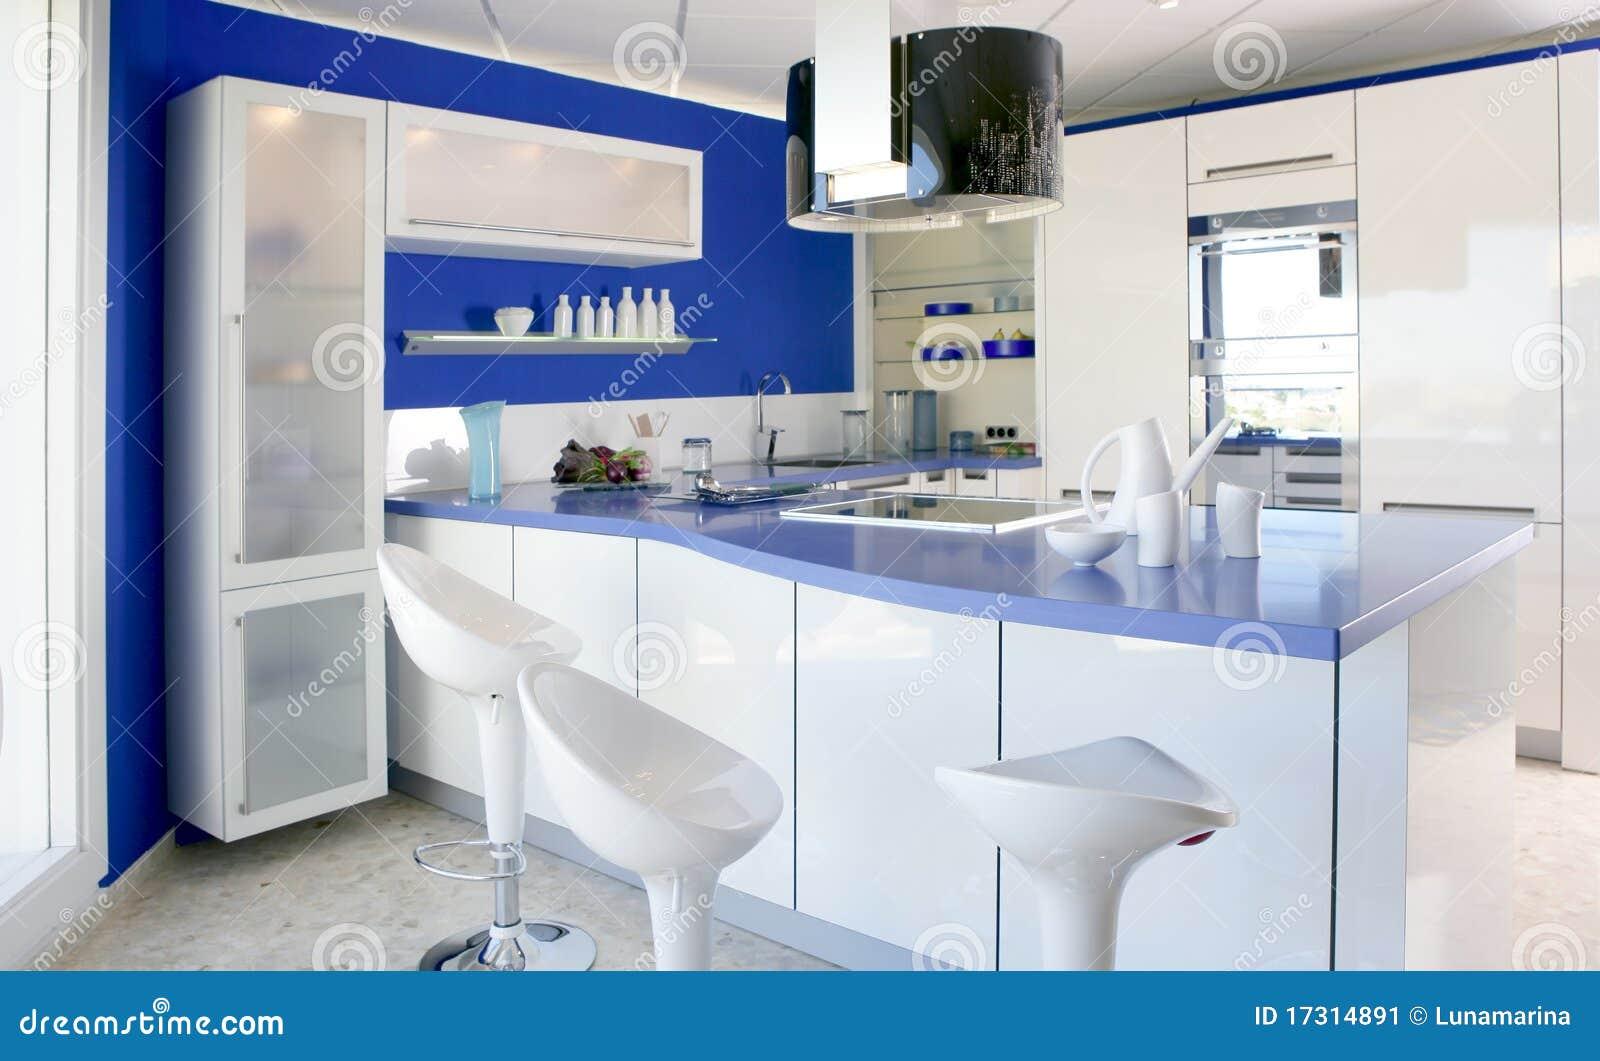 Casa moderna del dise o interior de la cocina blanca azul - Diseno interiores casas ...